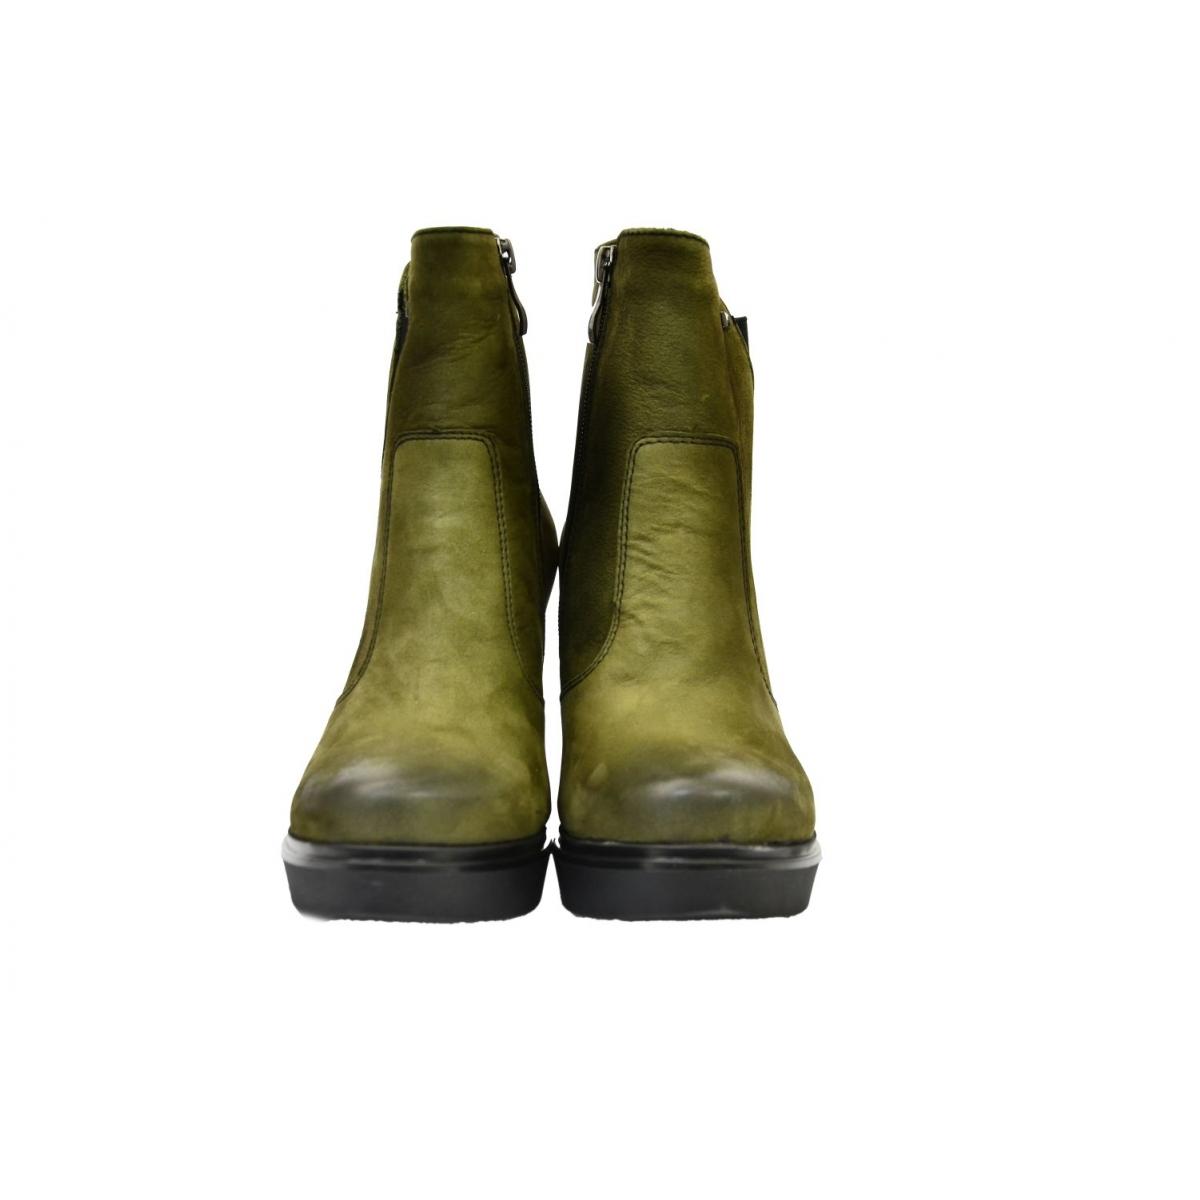 9358770d8fd7 Dámske olivovo zelené kožené čižmy SOSNA - 3